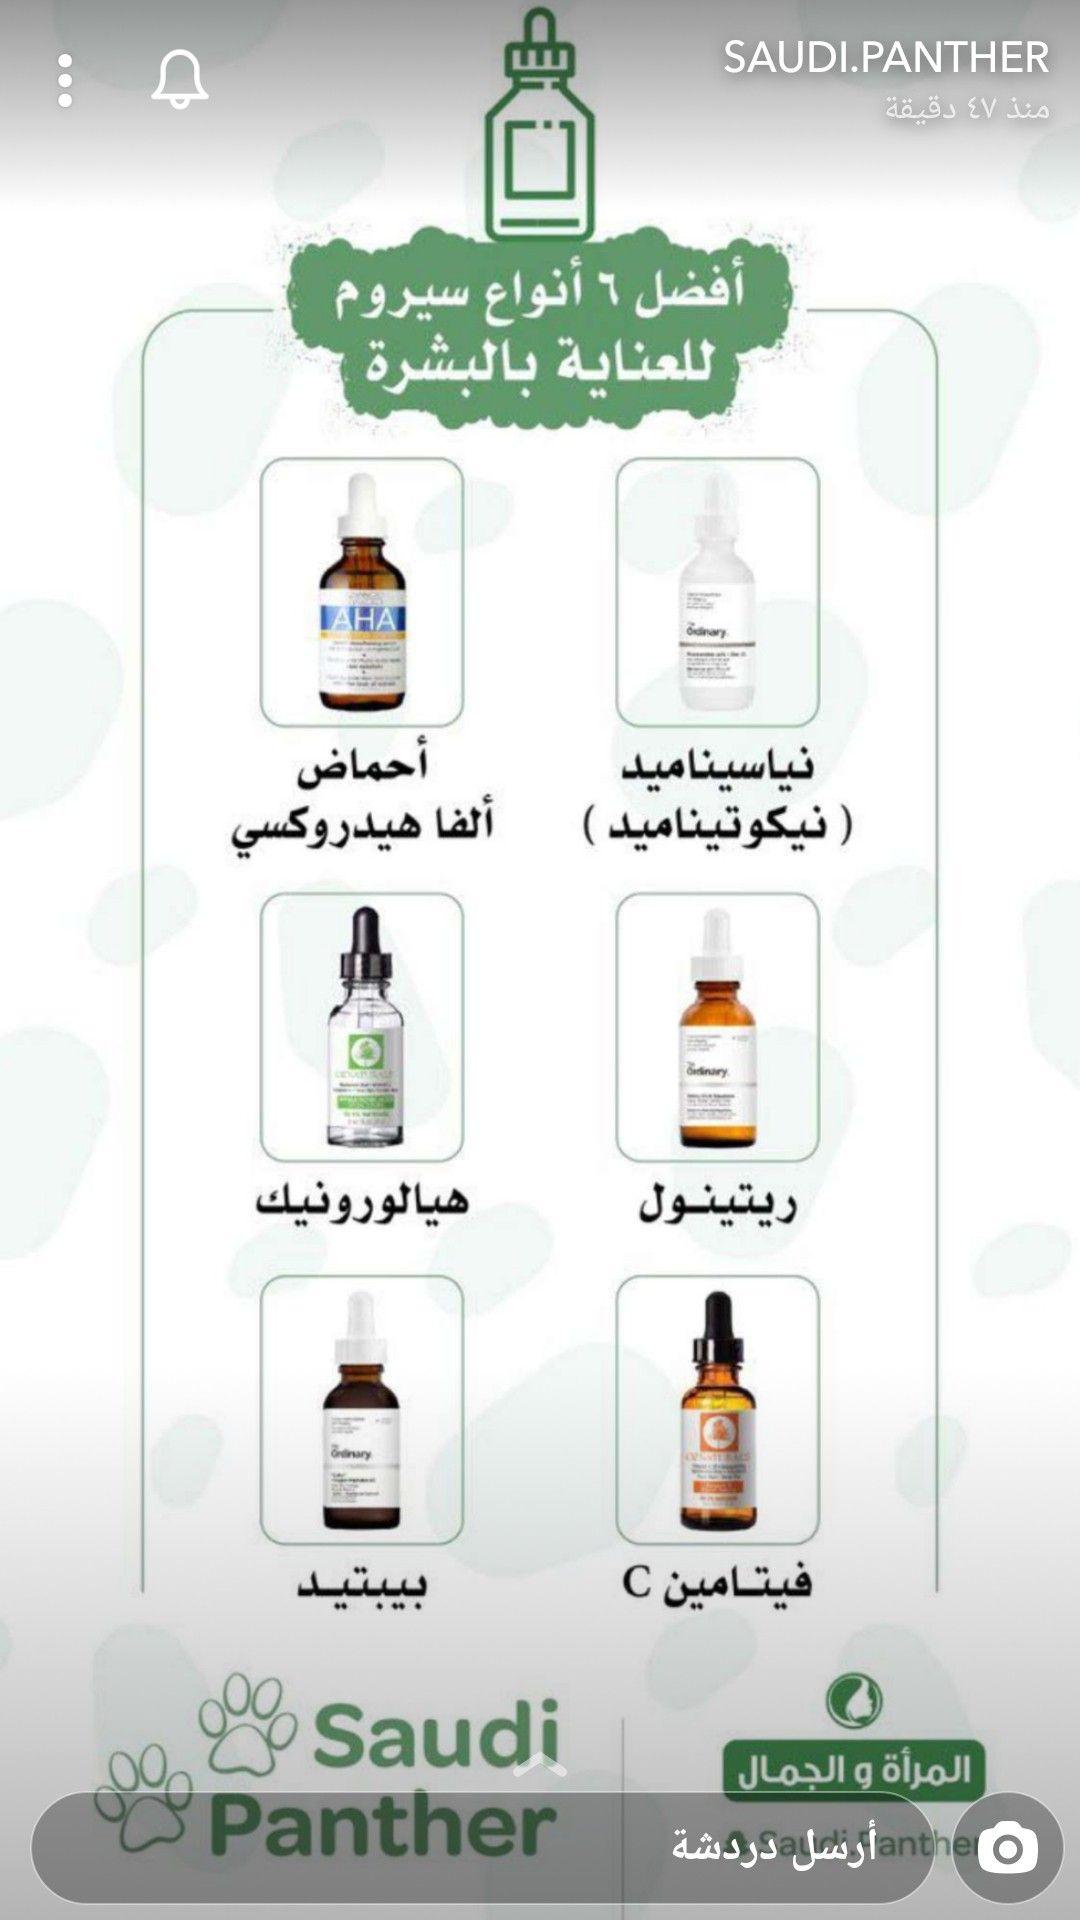 Pin By نعيمة On كريمات و قطرات و غسولات وكل مايخص البشرة Natural Skin Care Ingredients Beauty Skin Care Routine Diy Skin Care Routine